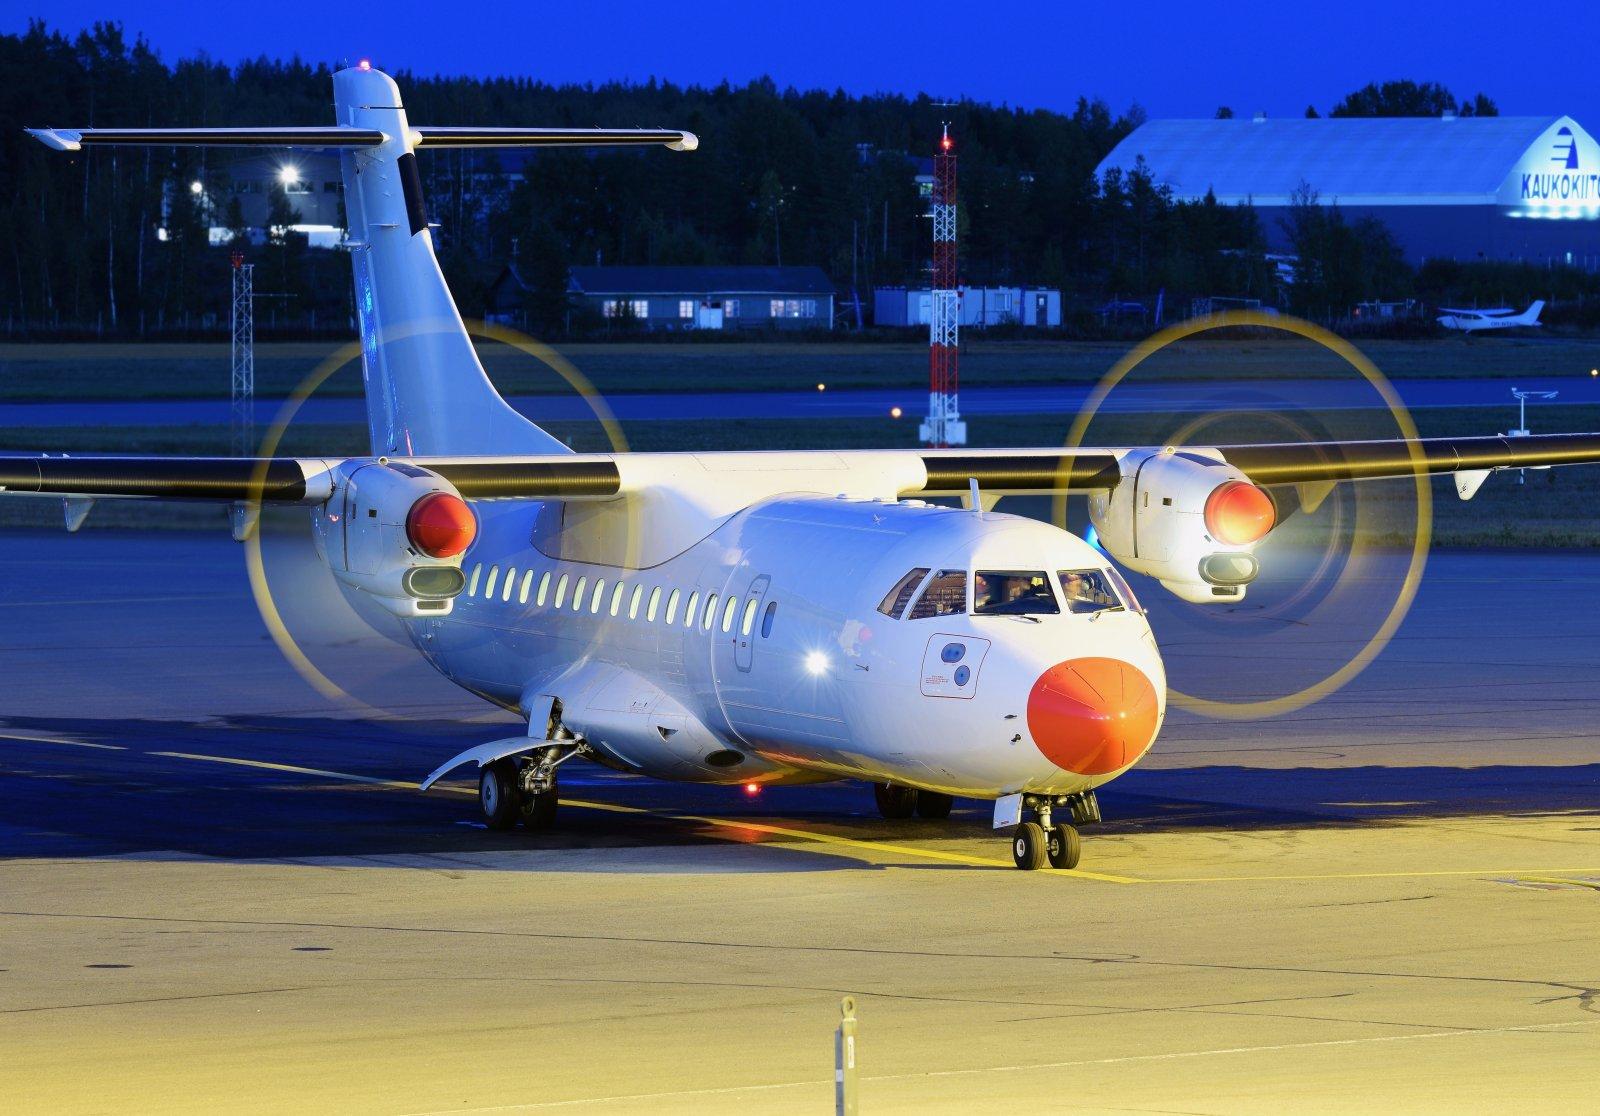 OY-CIU - ATR 42-300 - Danish Air Transport (DAT) - 23.9.2019